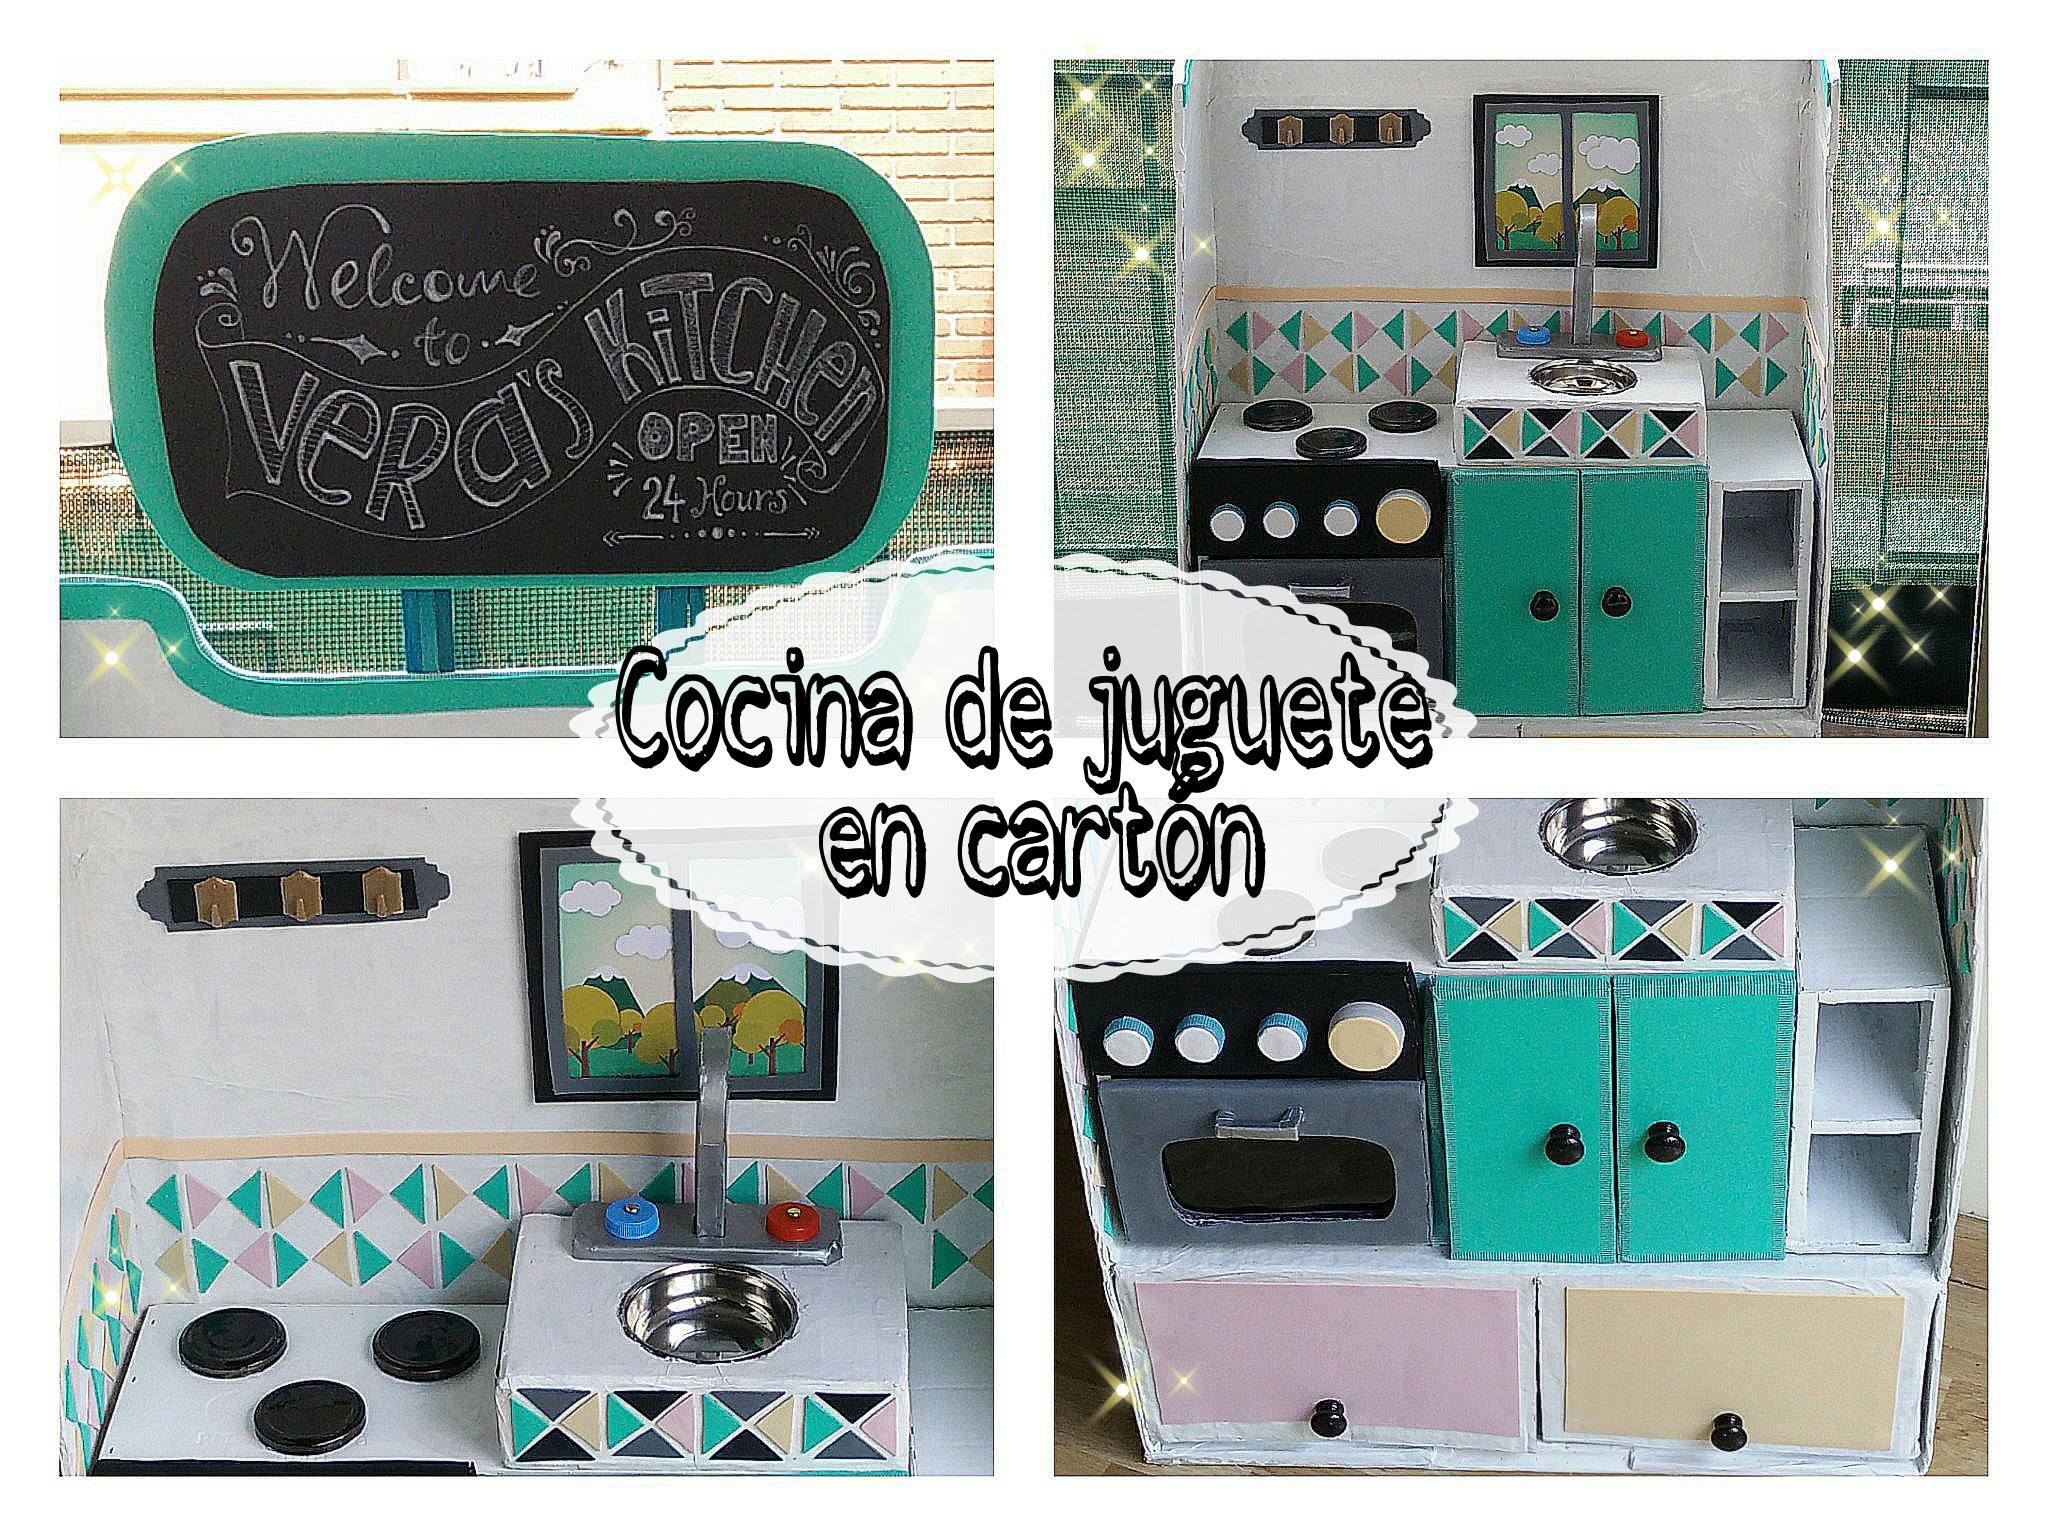 DIY ✿ Manualidades en cartón - Cocina de juguete | Cardboard playkitchen